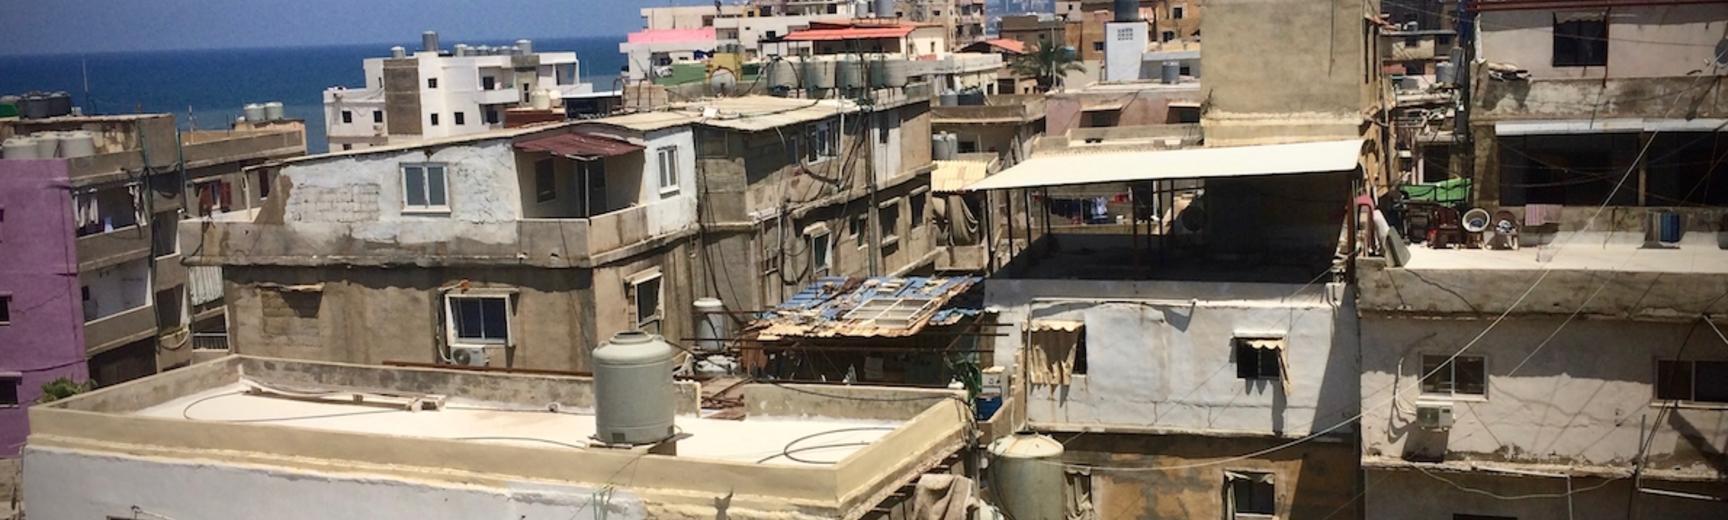 Informal area of Ouzaii in Beirut, Lebanon